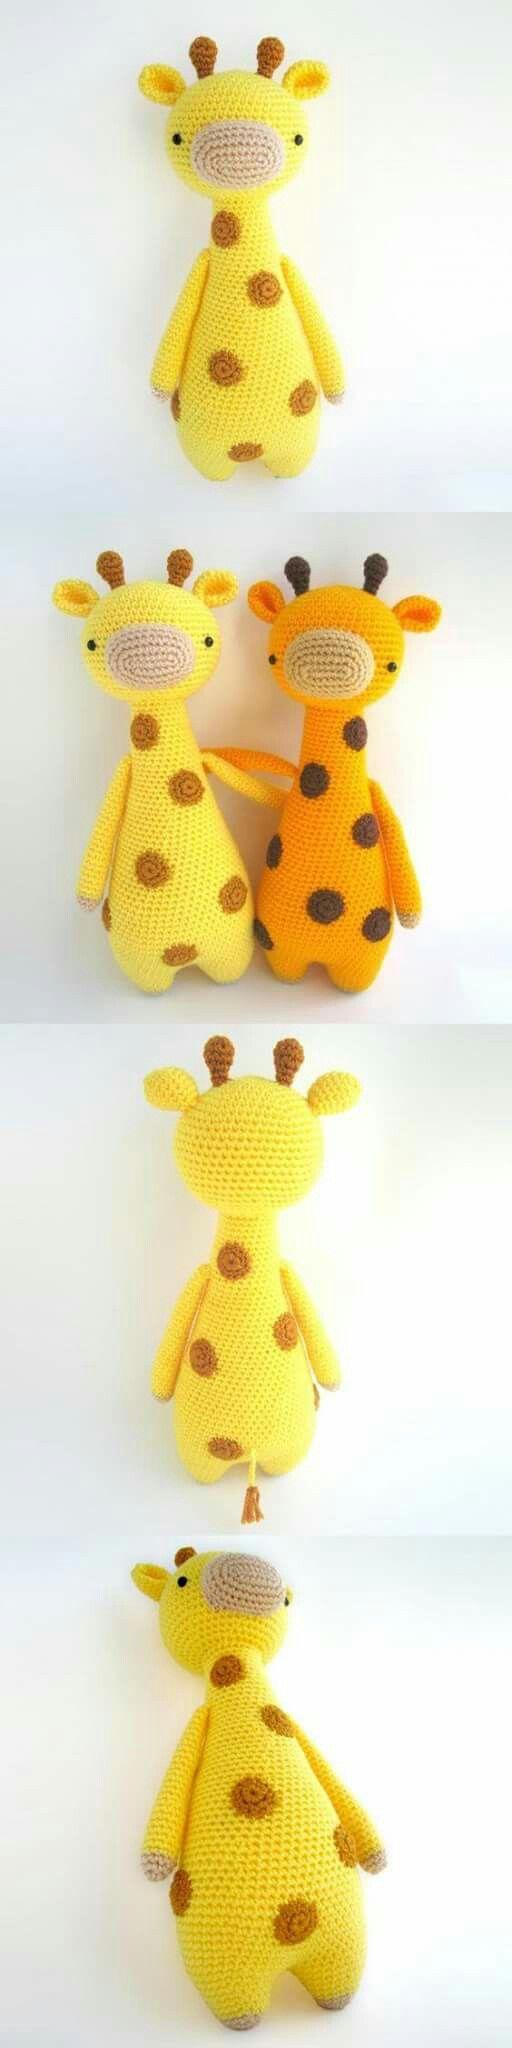 best craft chic images on pinterest amigurumi patterns crochet